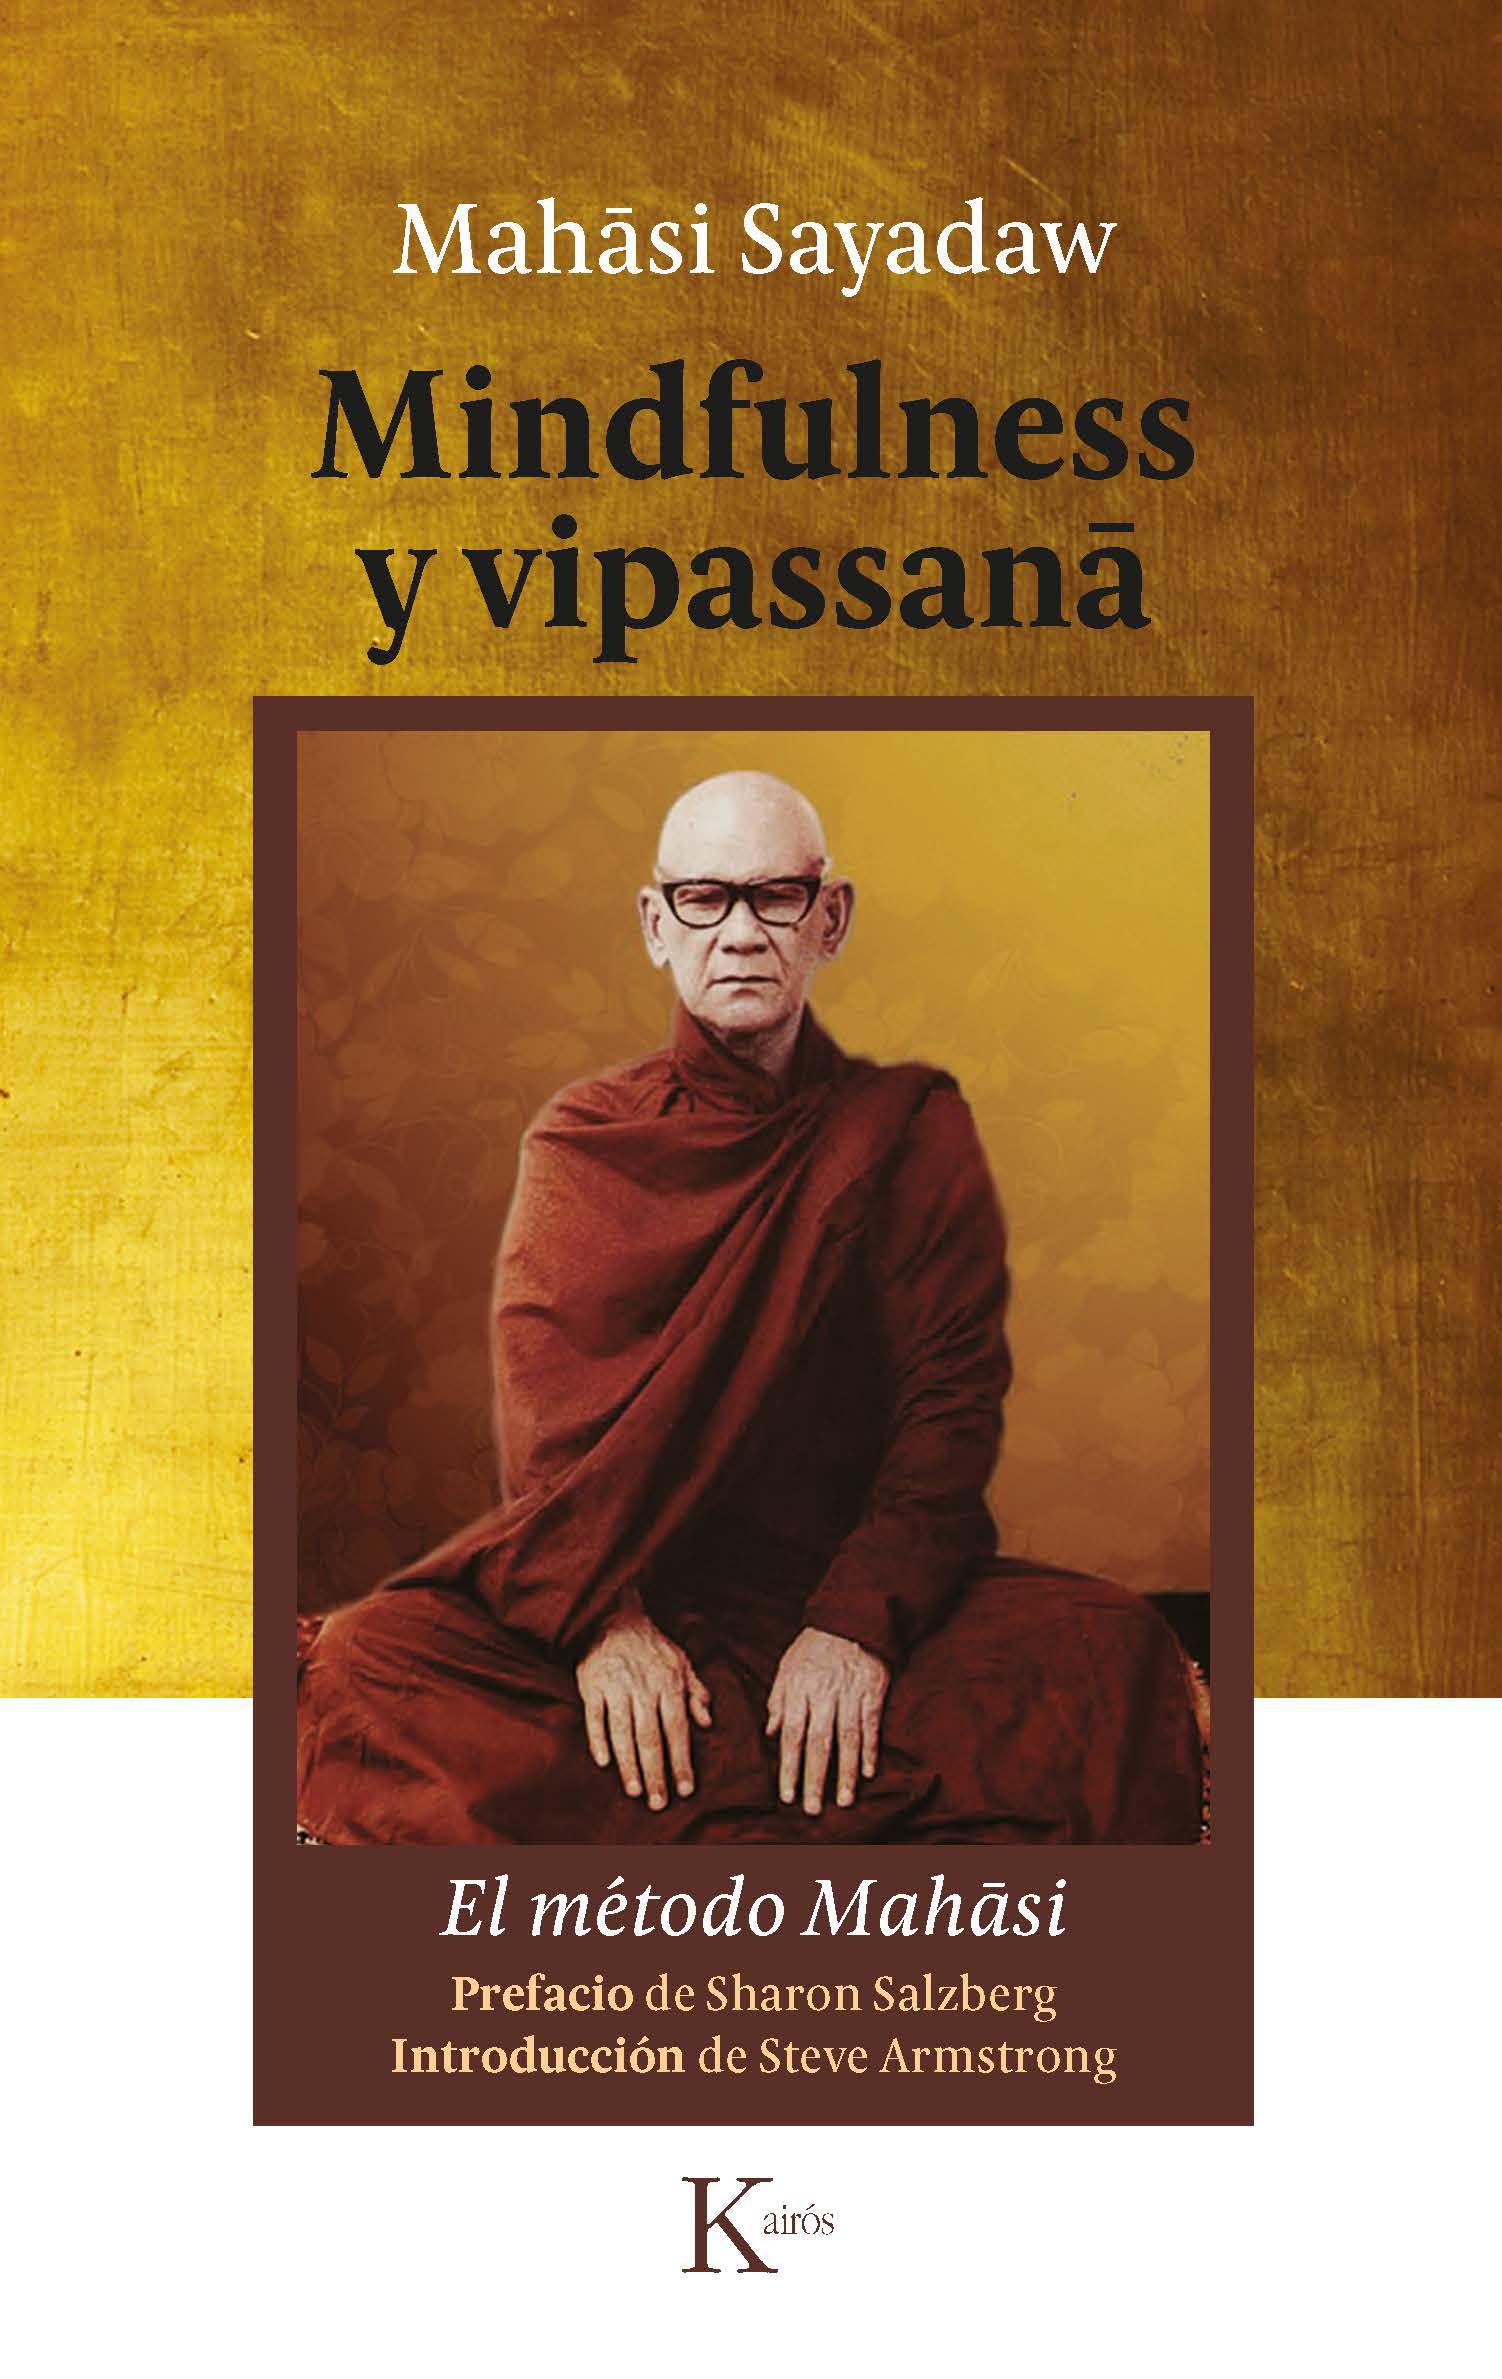 Mindfulness y vipassana   «El método Mahasi»